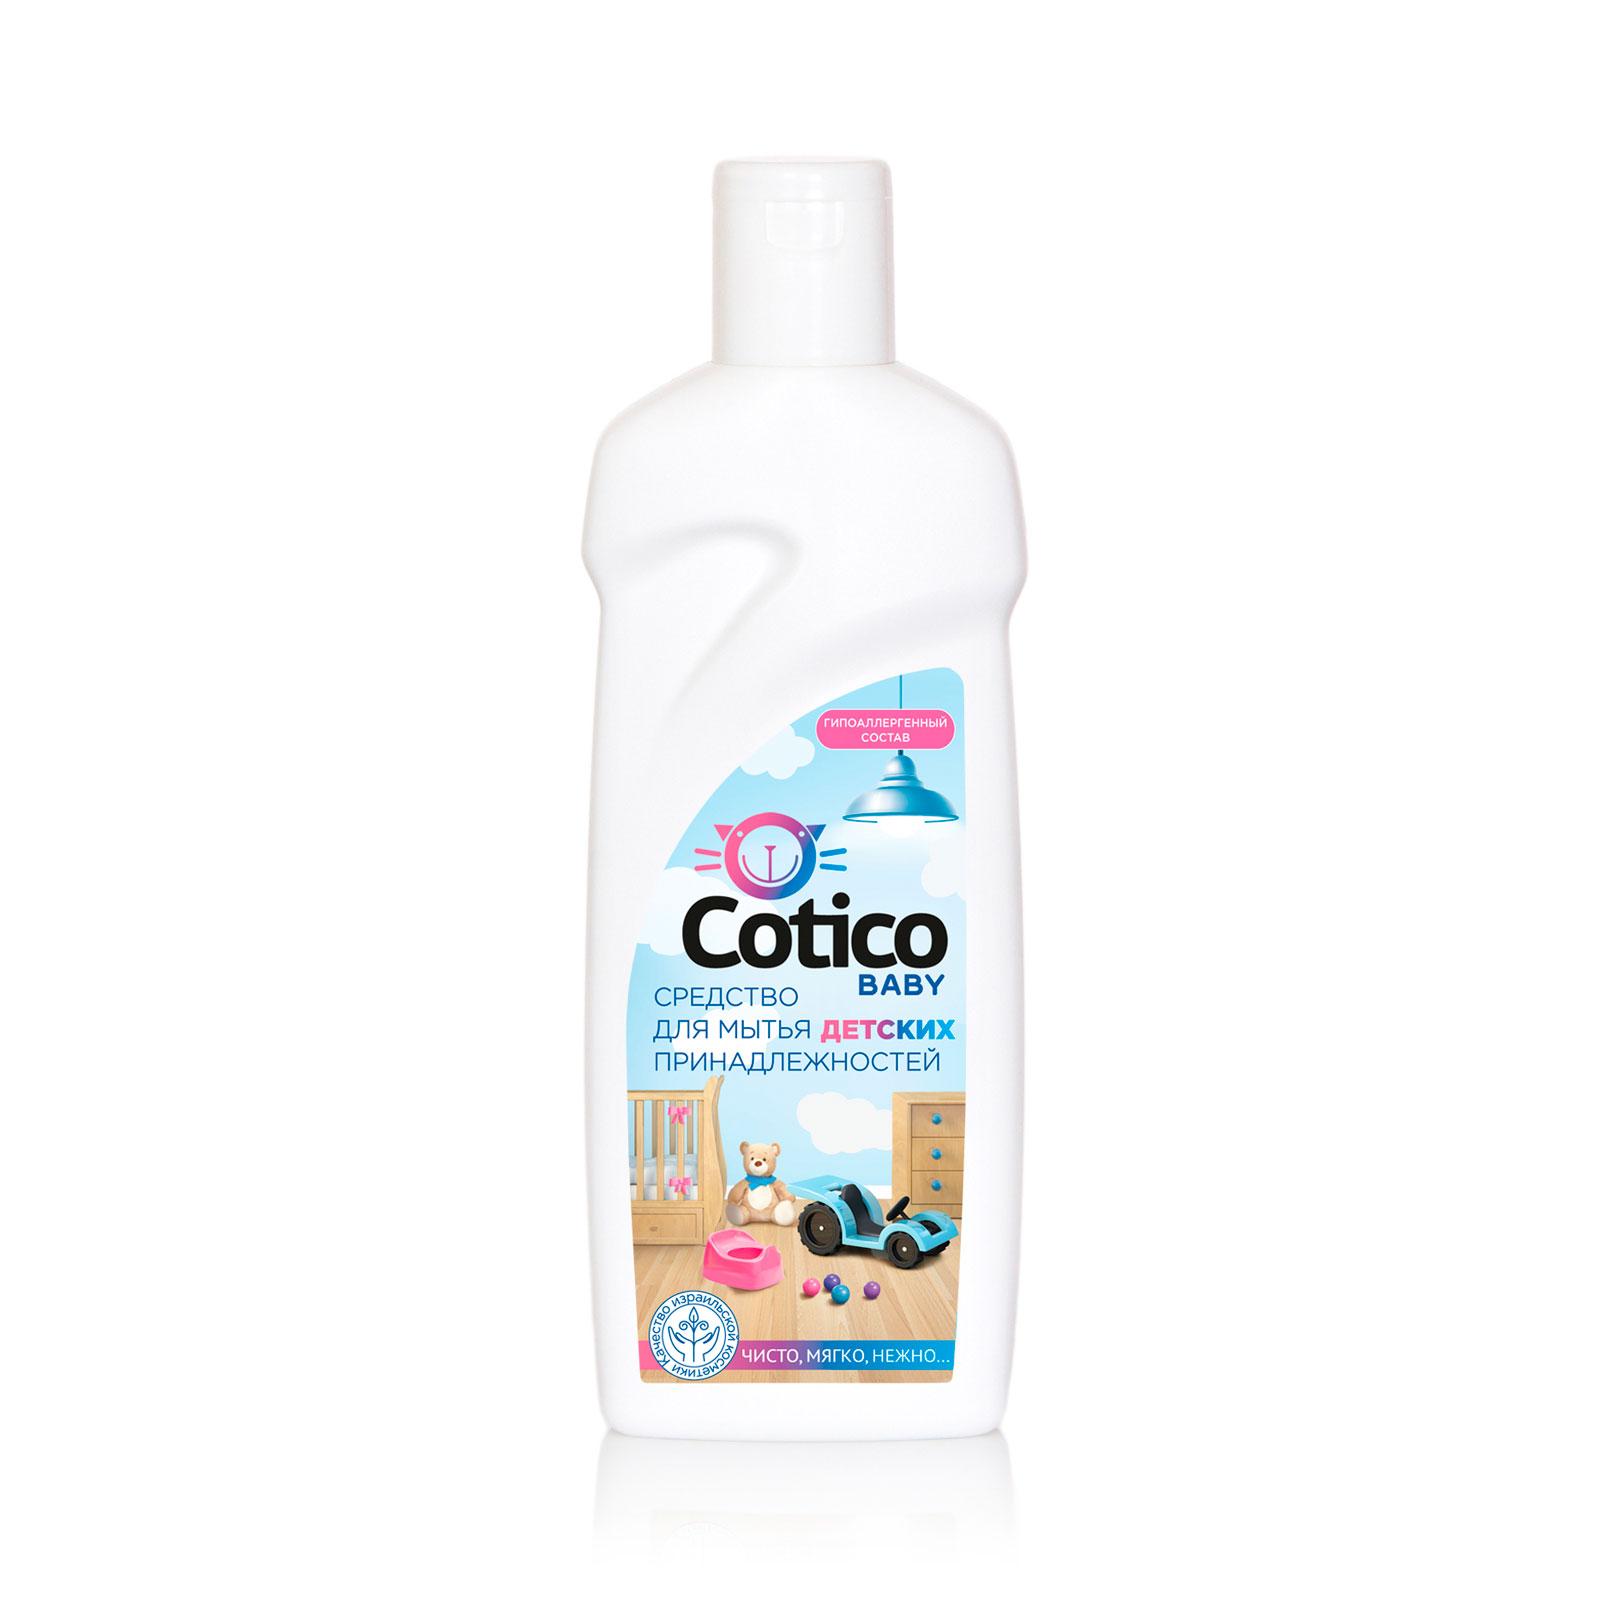 ���� ��� ����� ������� ��������������� Cotico 380 ��